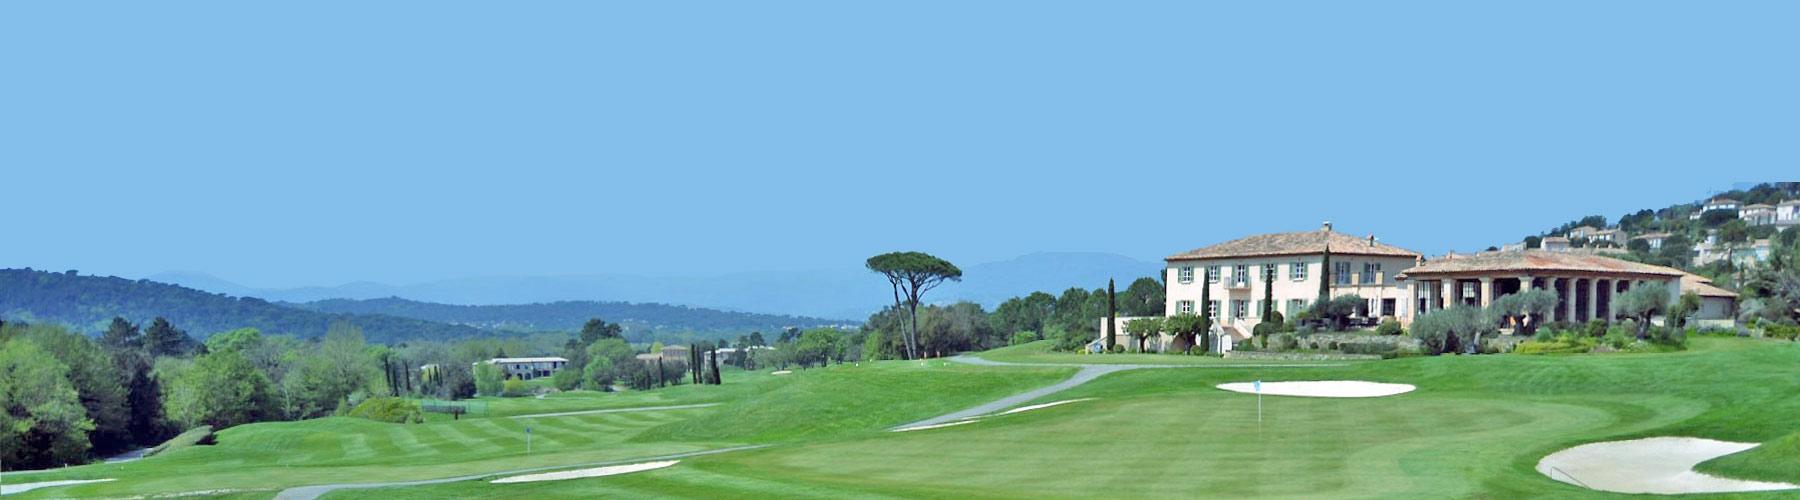 golf-saint-tropez2